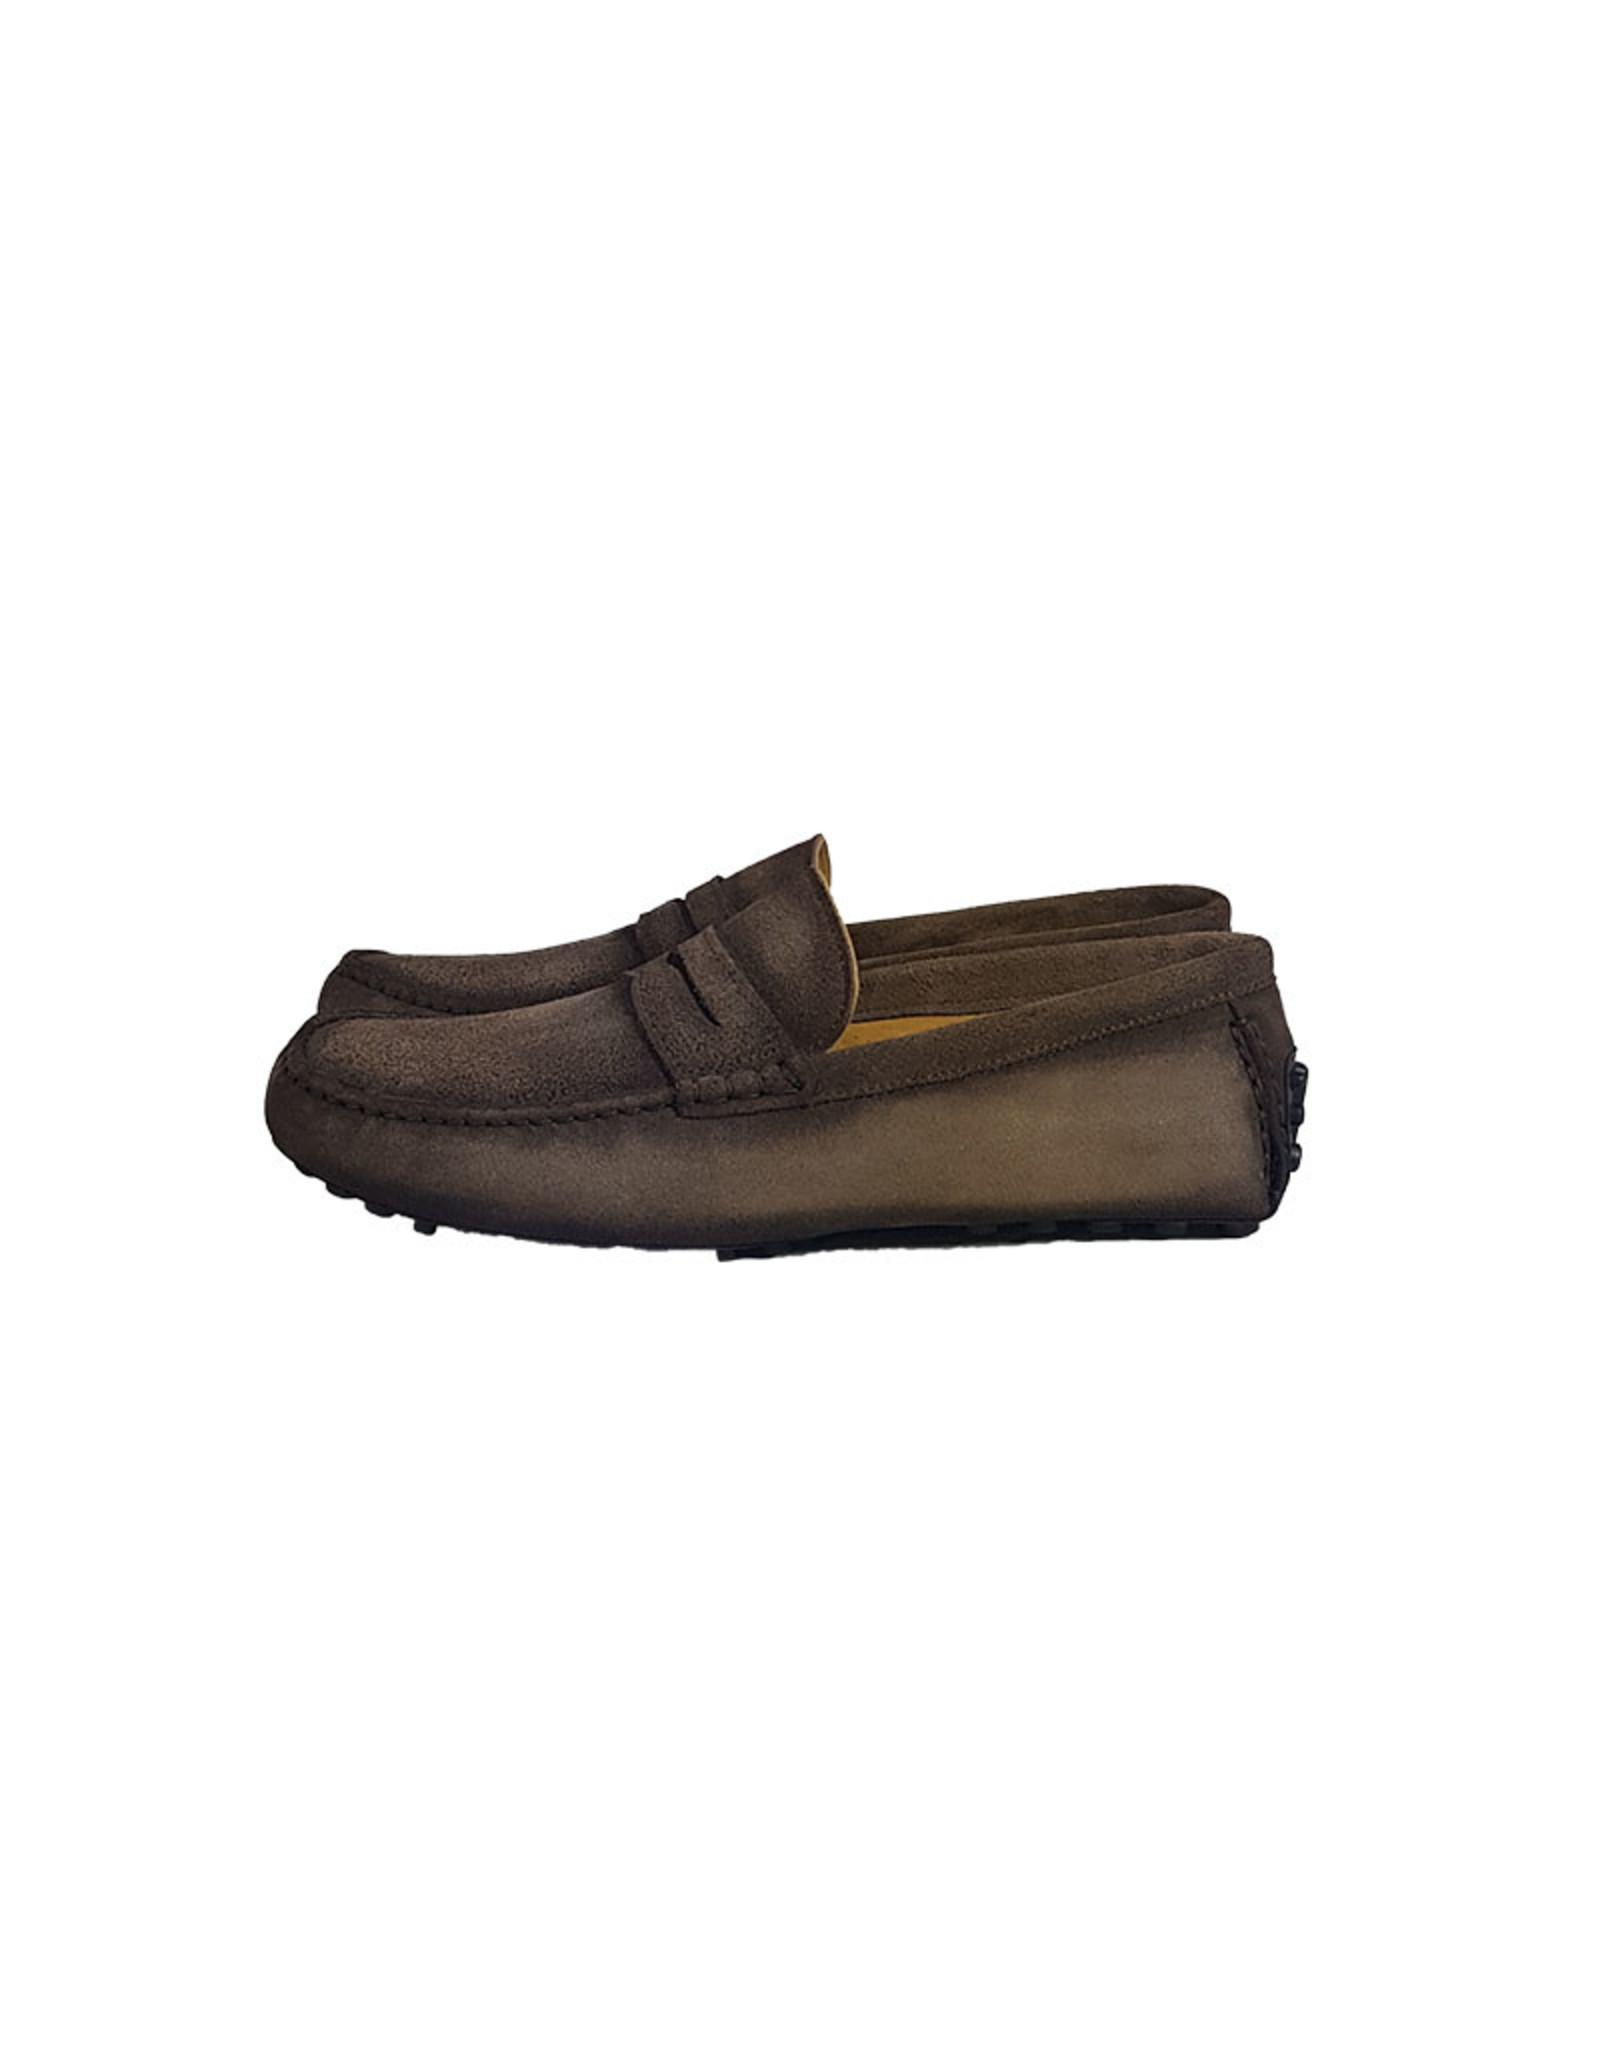 Zampiere Zampiere schoenen mocassins bruin Circe Tobaco M:5390 V18